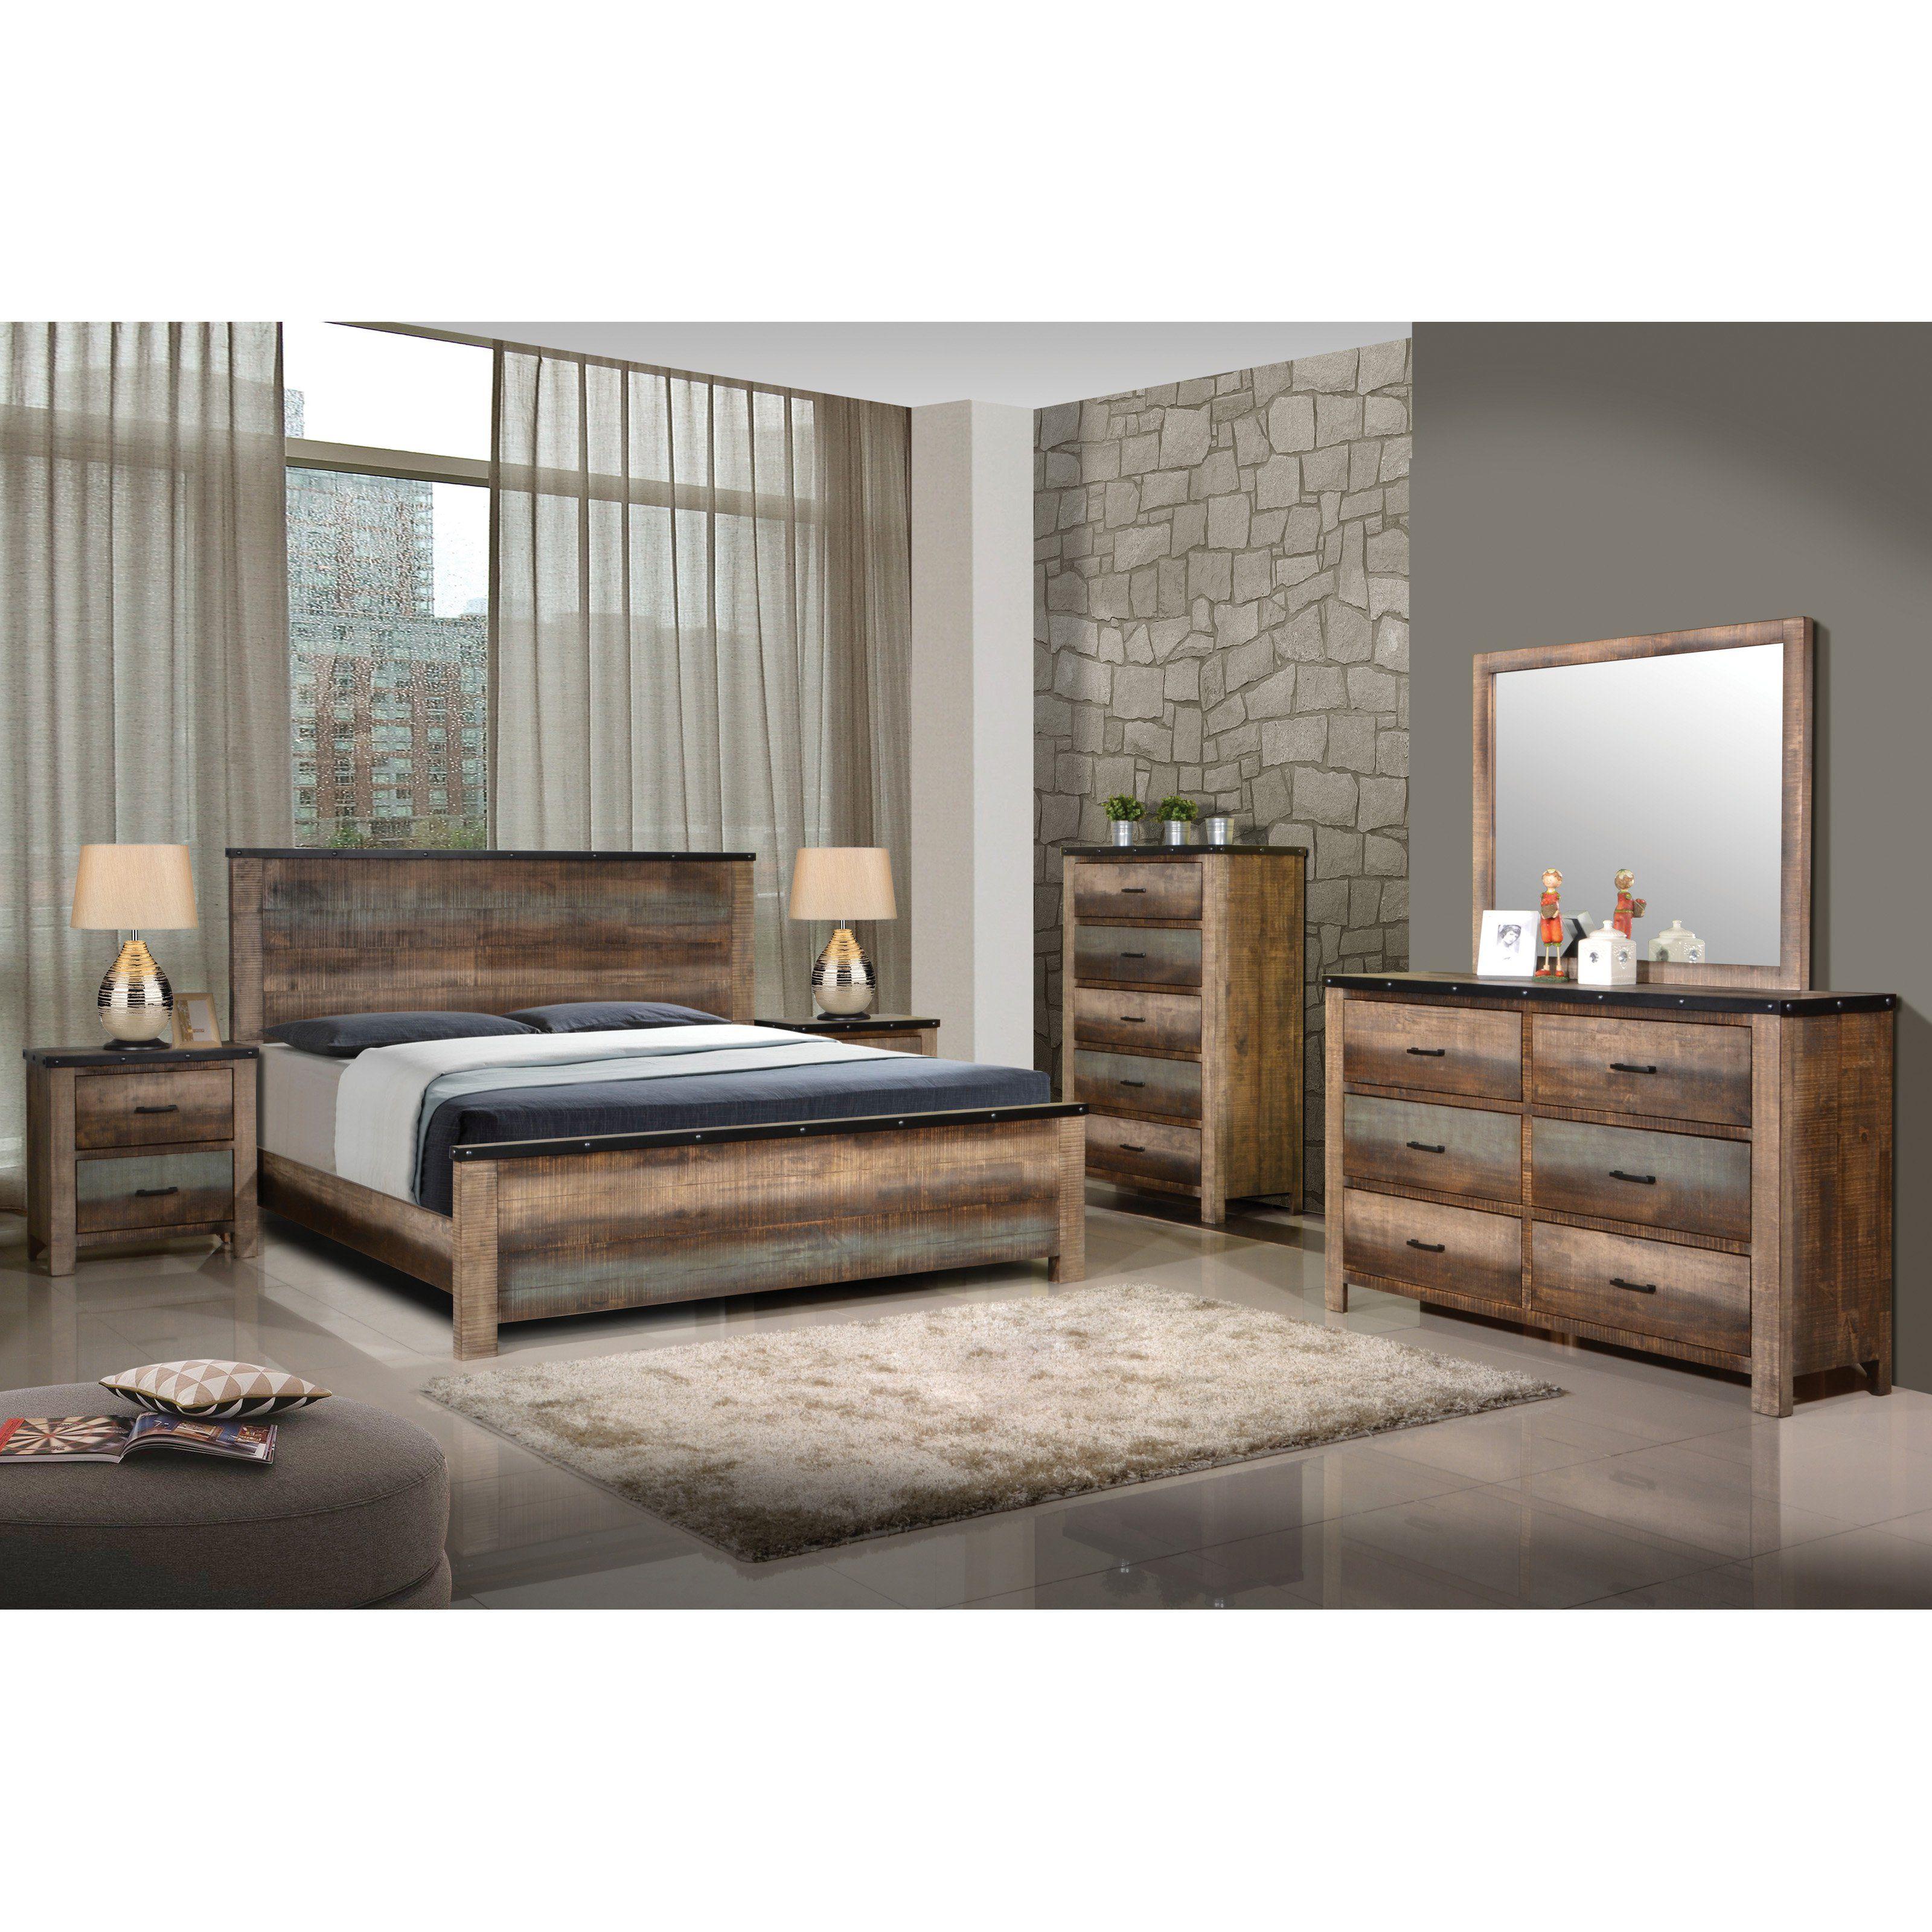 Coaster Furniture Sembene Panel Bed Bedroom sets queen